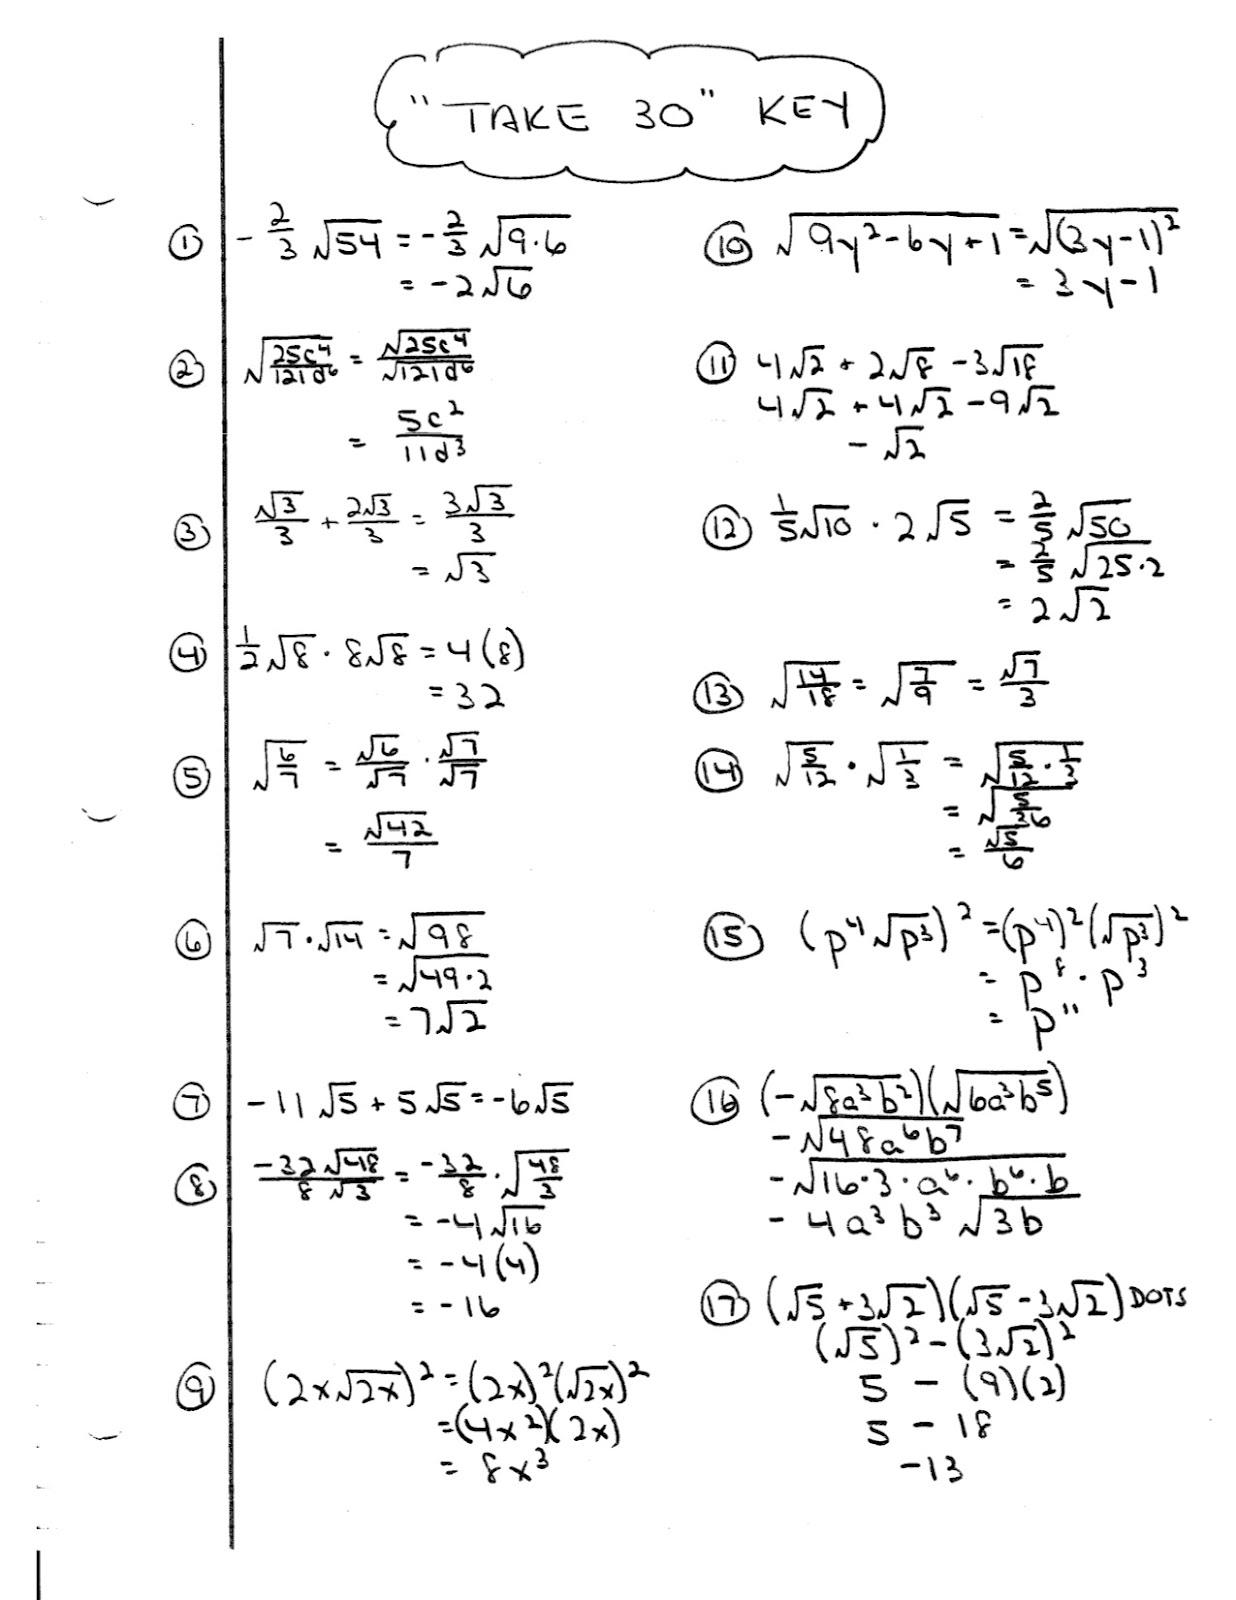 math worksheet : did you hear about math worksheet inequality  did you hear about  : Inequality Math Worksheets